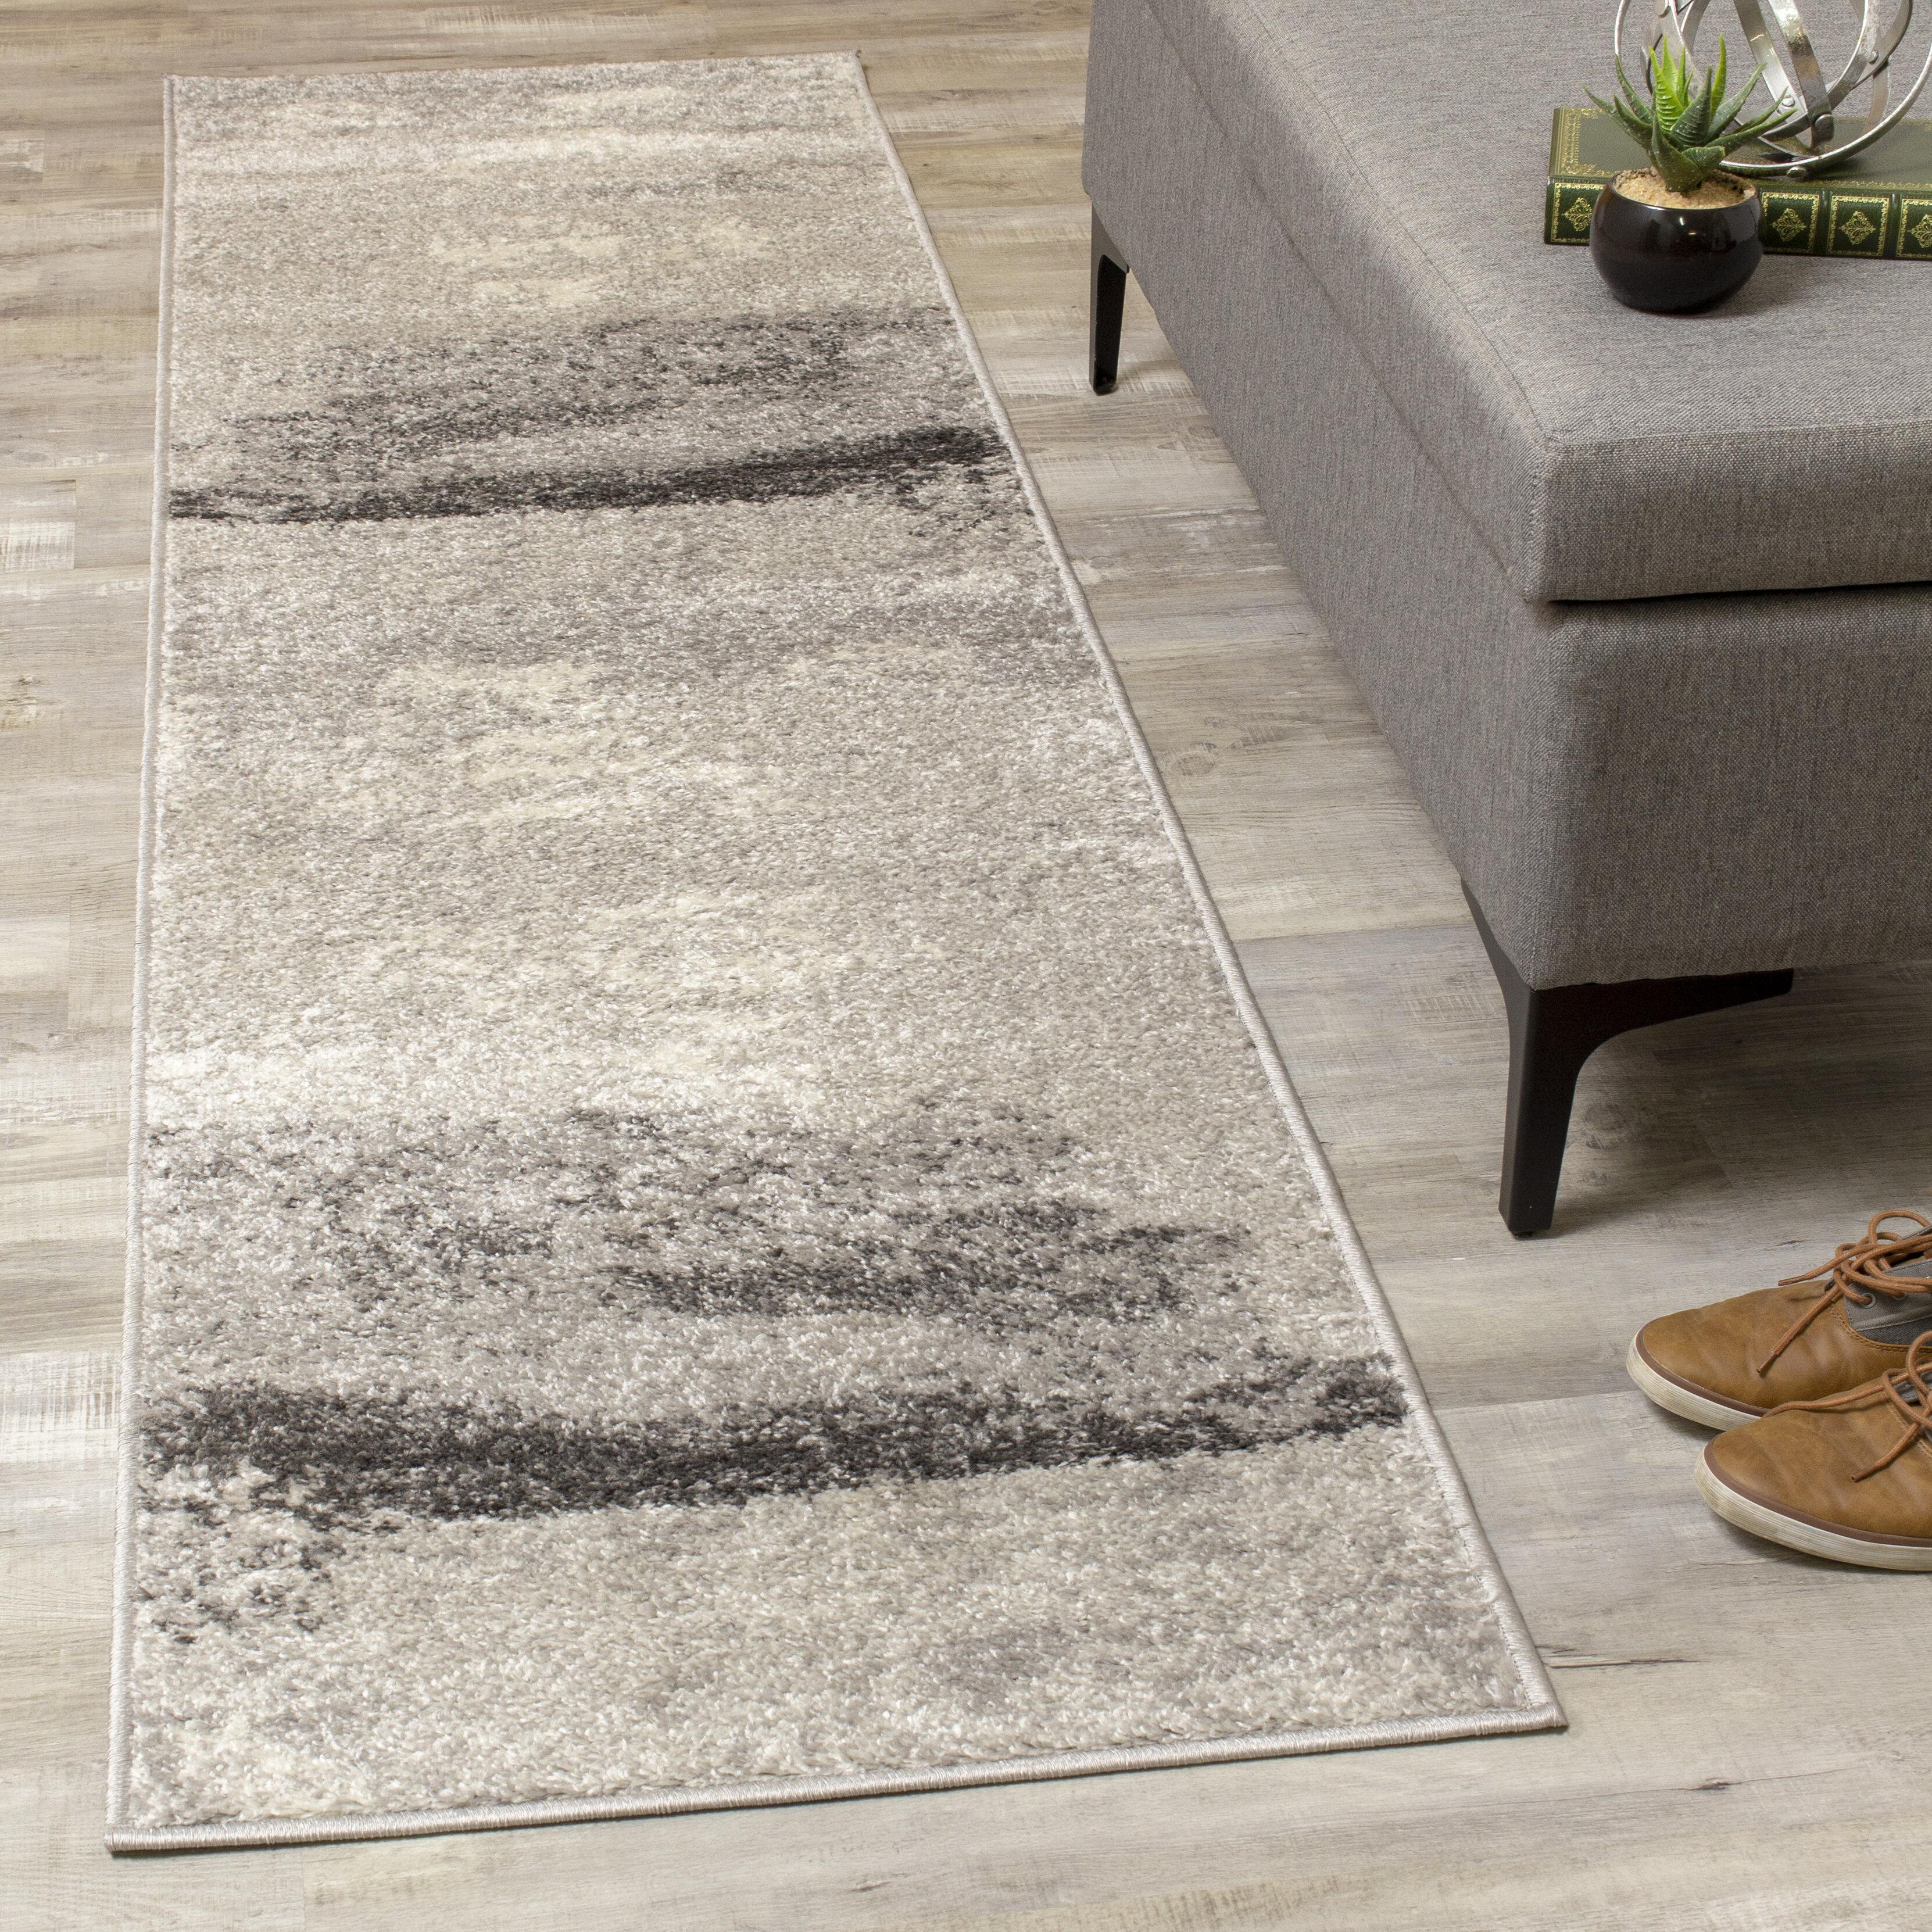 Brayden Studio Benn Abstract Cool Gray Area Rug Reviews Wayfair